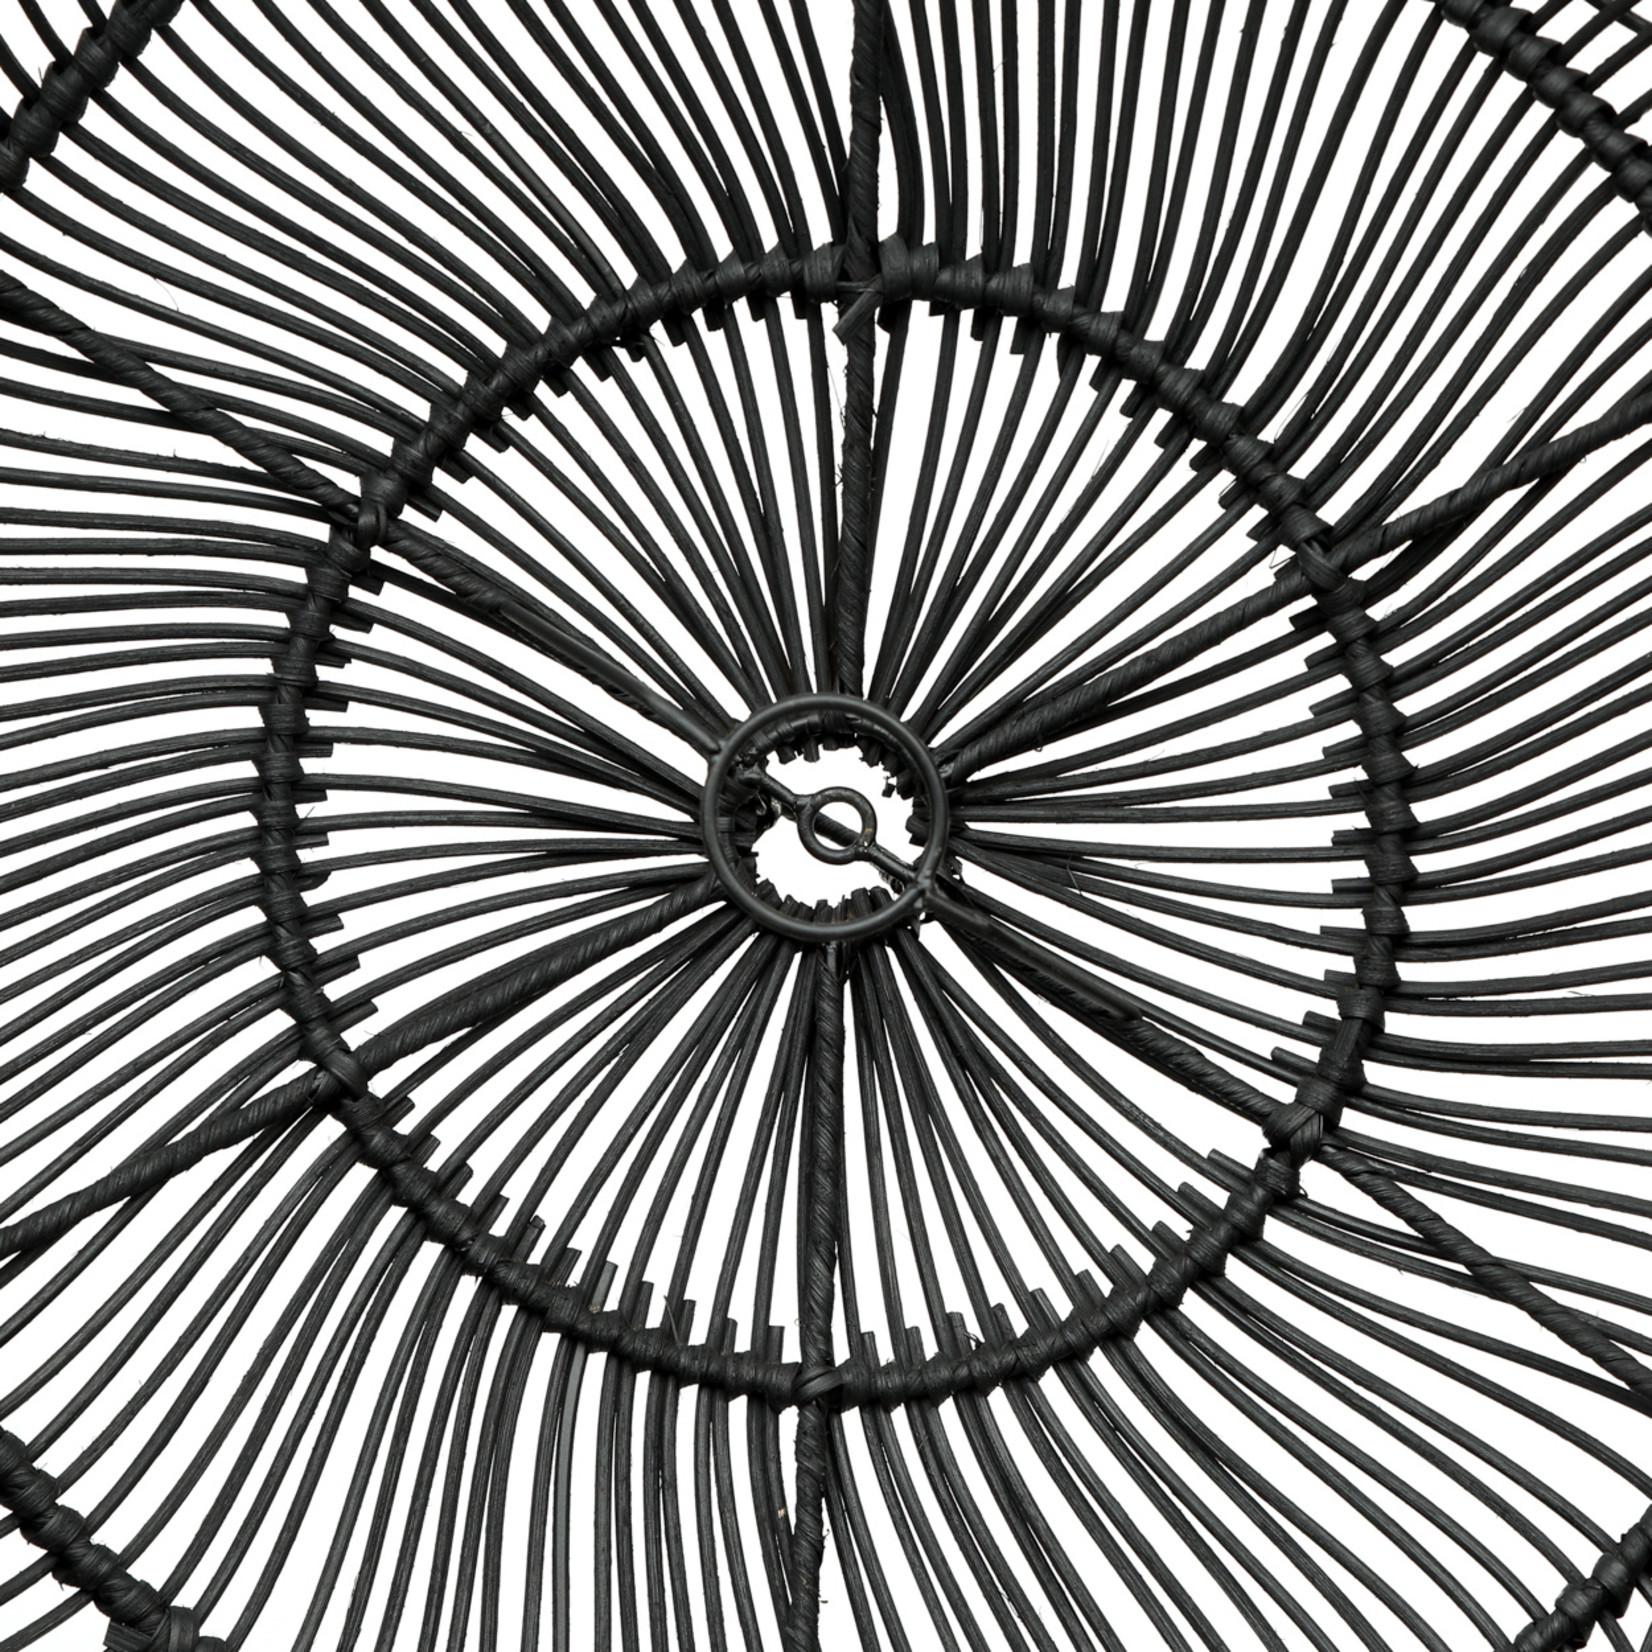 Bazar Bizar De Paraguas Hanglamp - Zwart - M